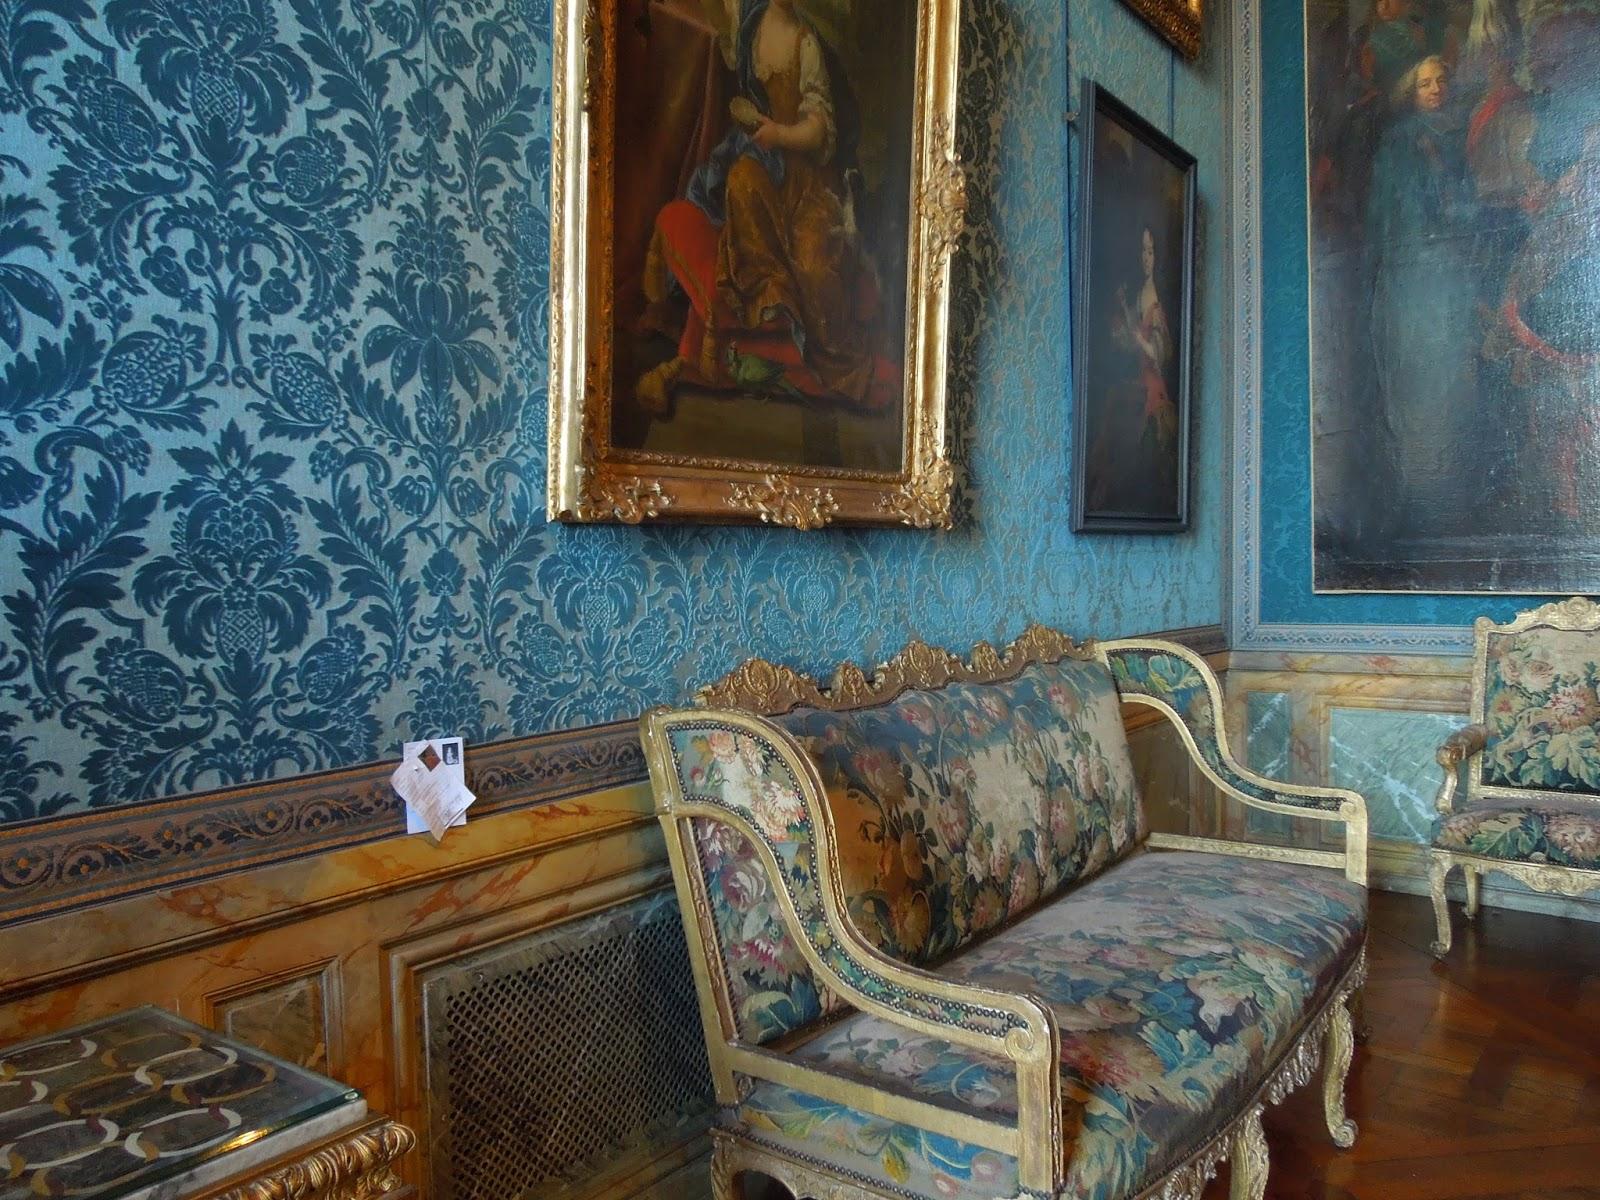 Marie Antoinette Inspired Bedroom Sew Cute Paris Trip Day 5 Chateau De Versailles